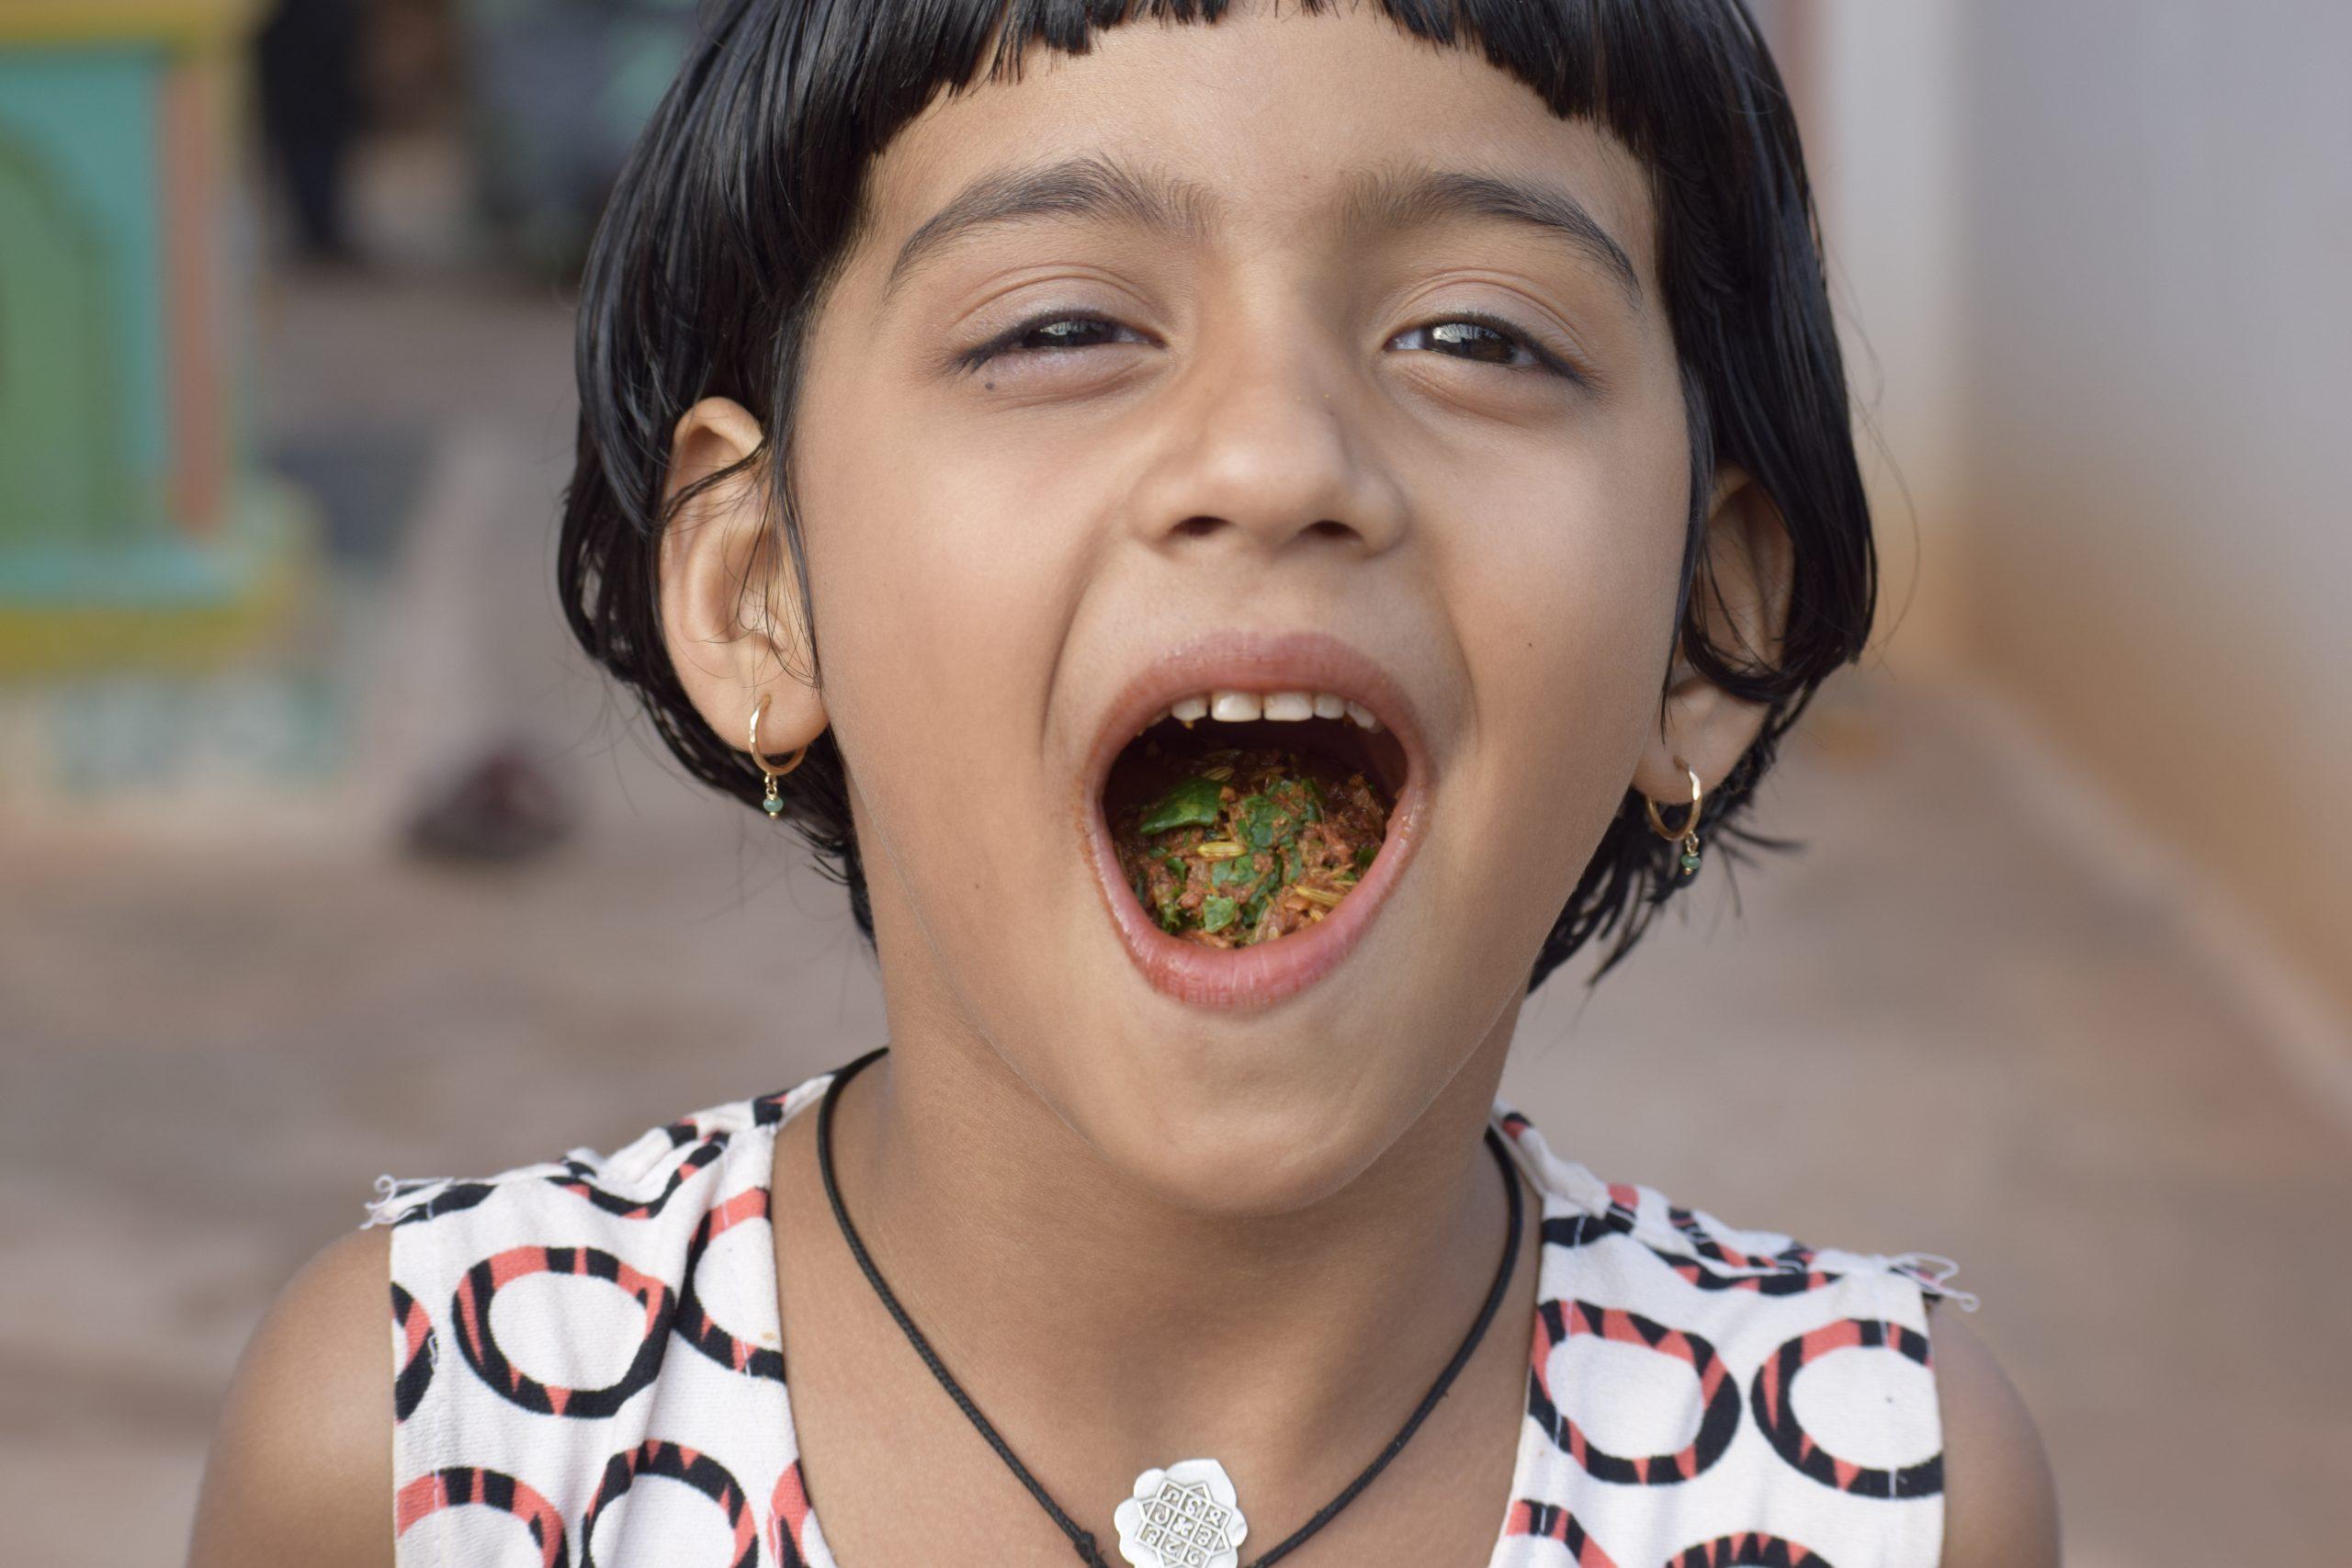 A girl child eating sweet pan